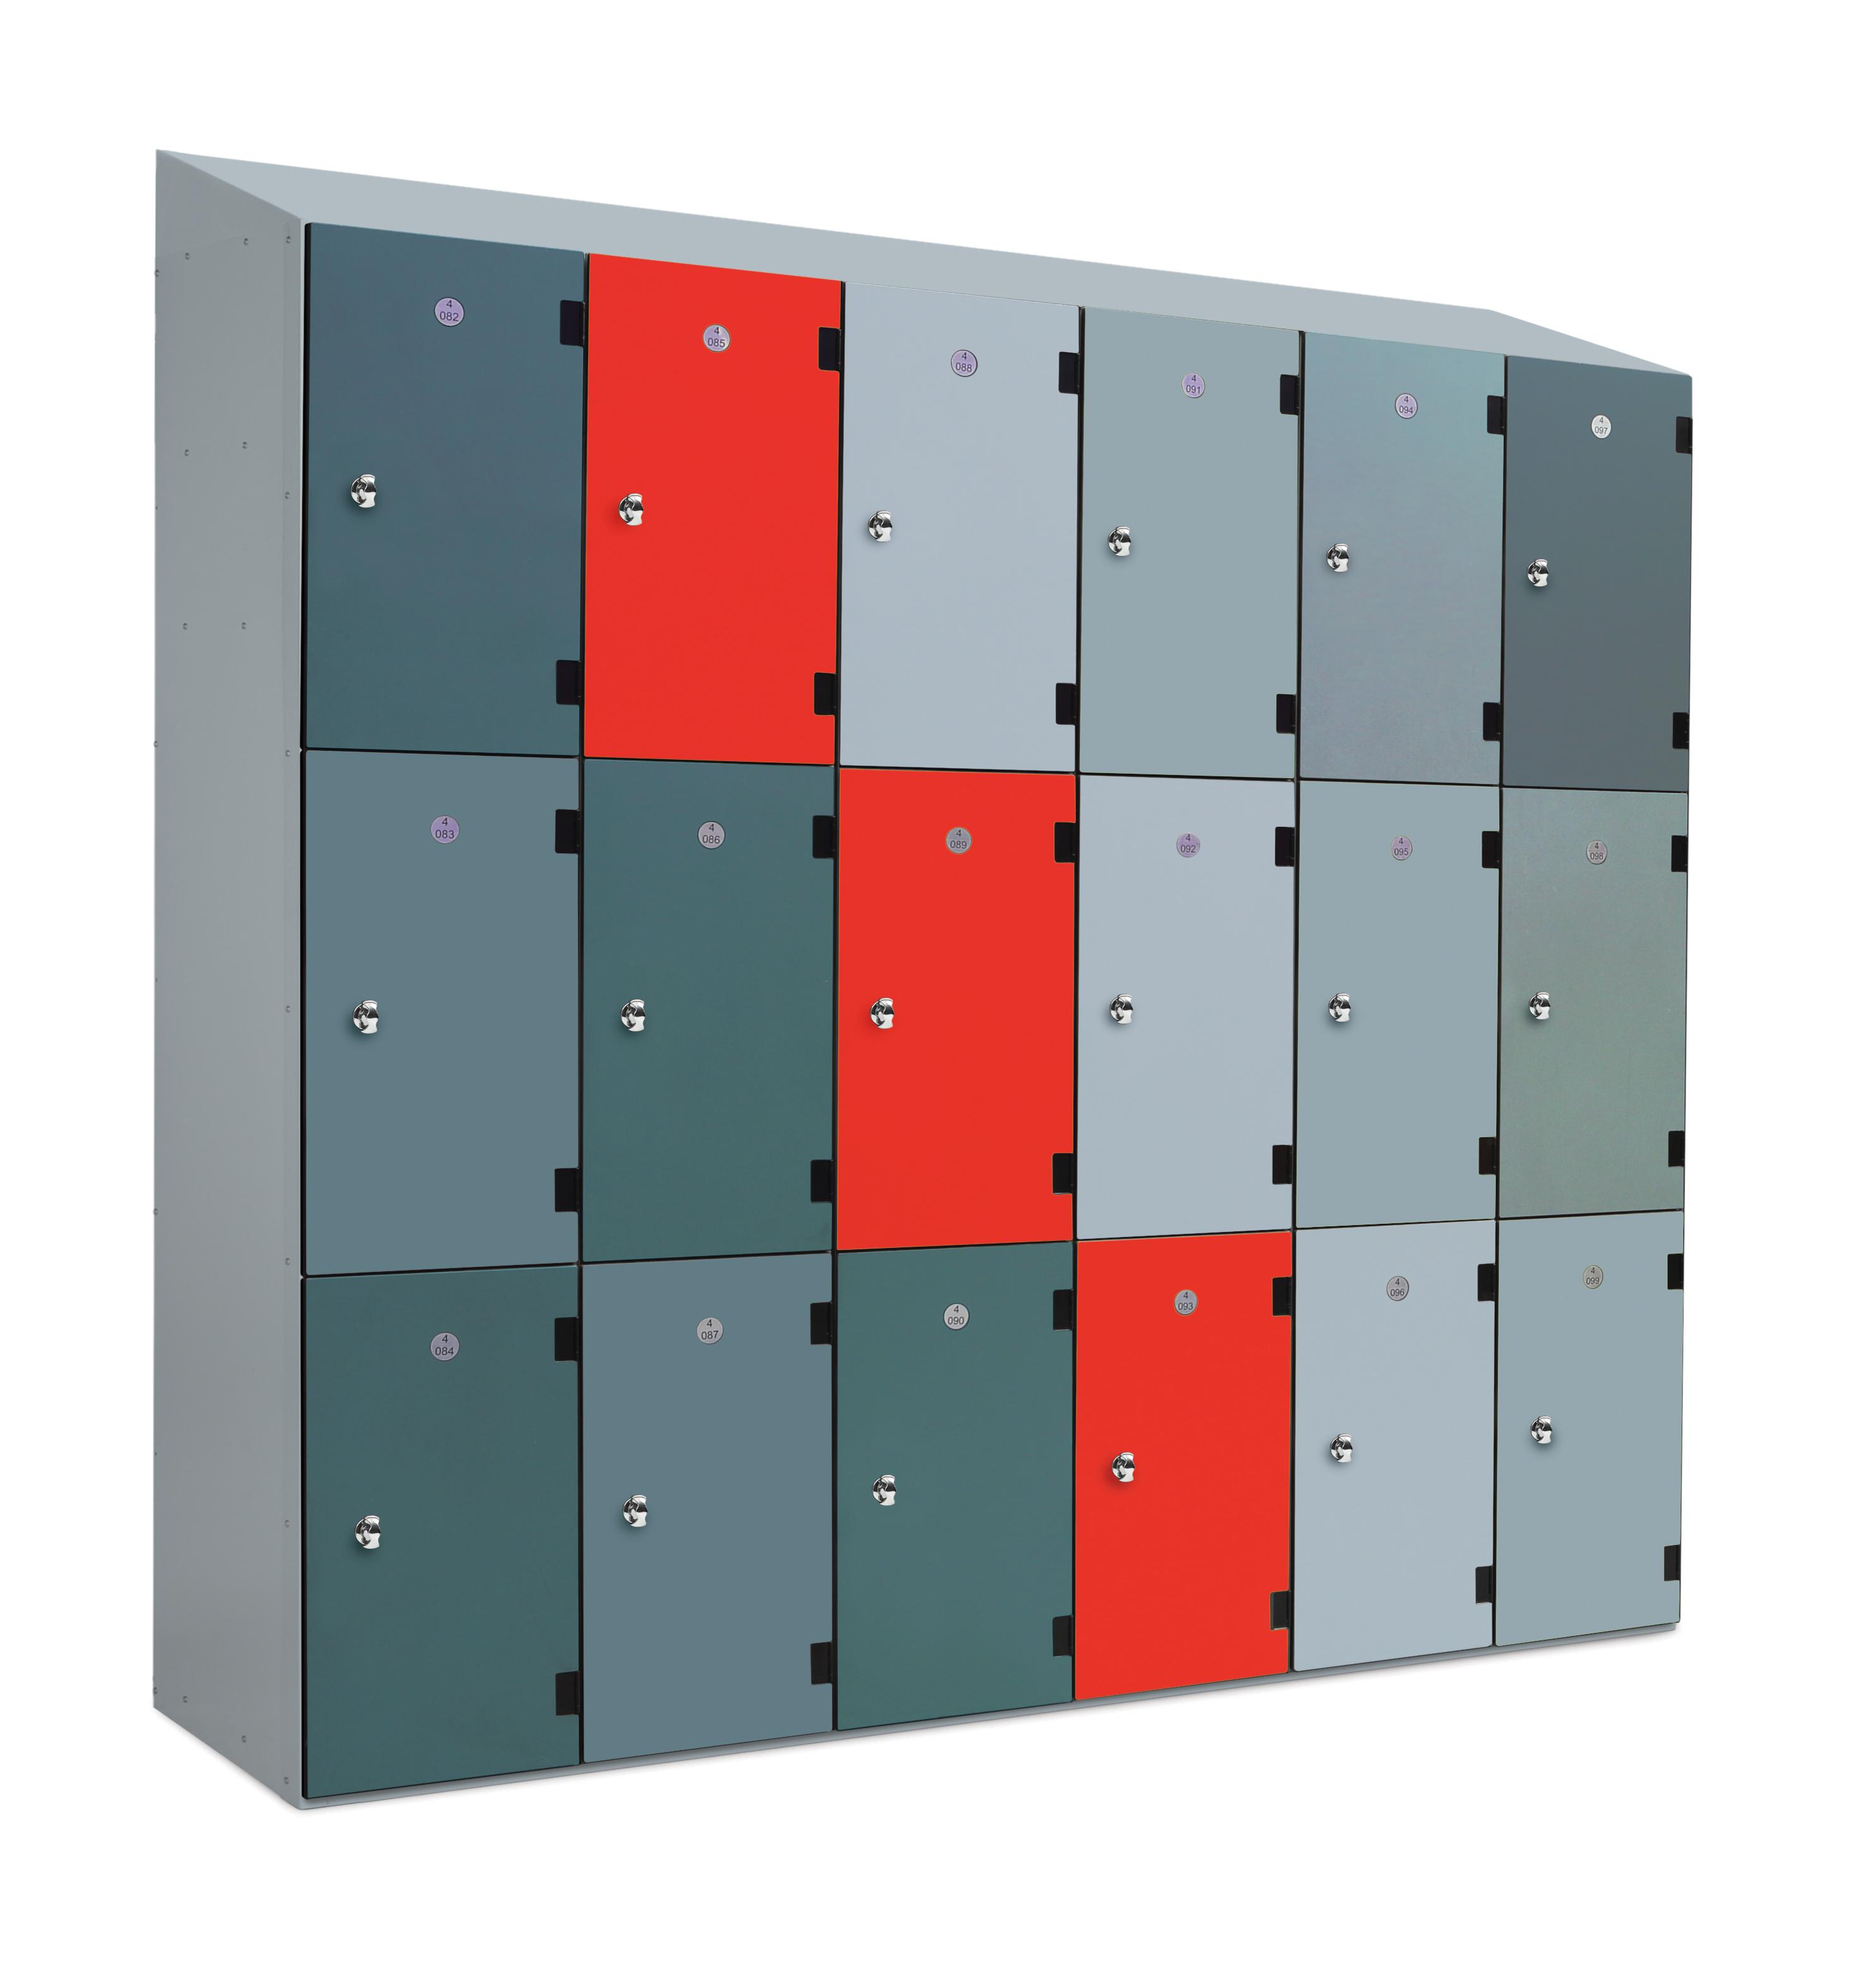 Low level 2 Tiers Overlay Laminate School Locker